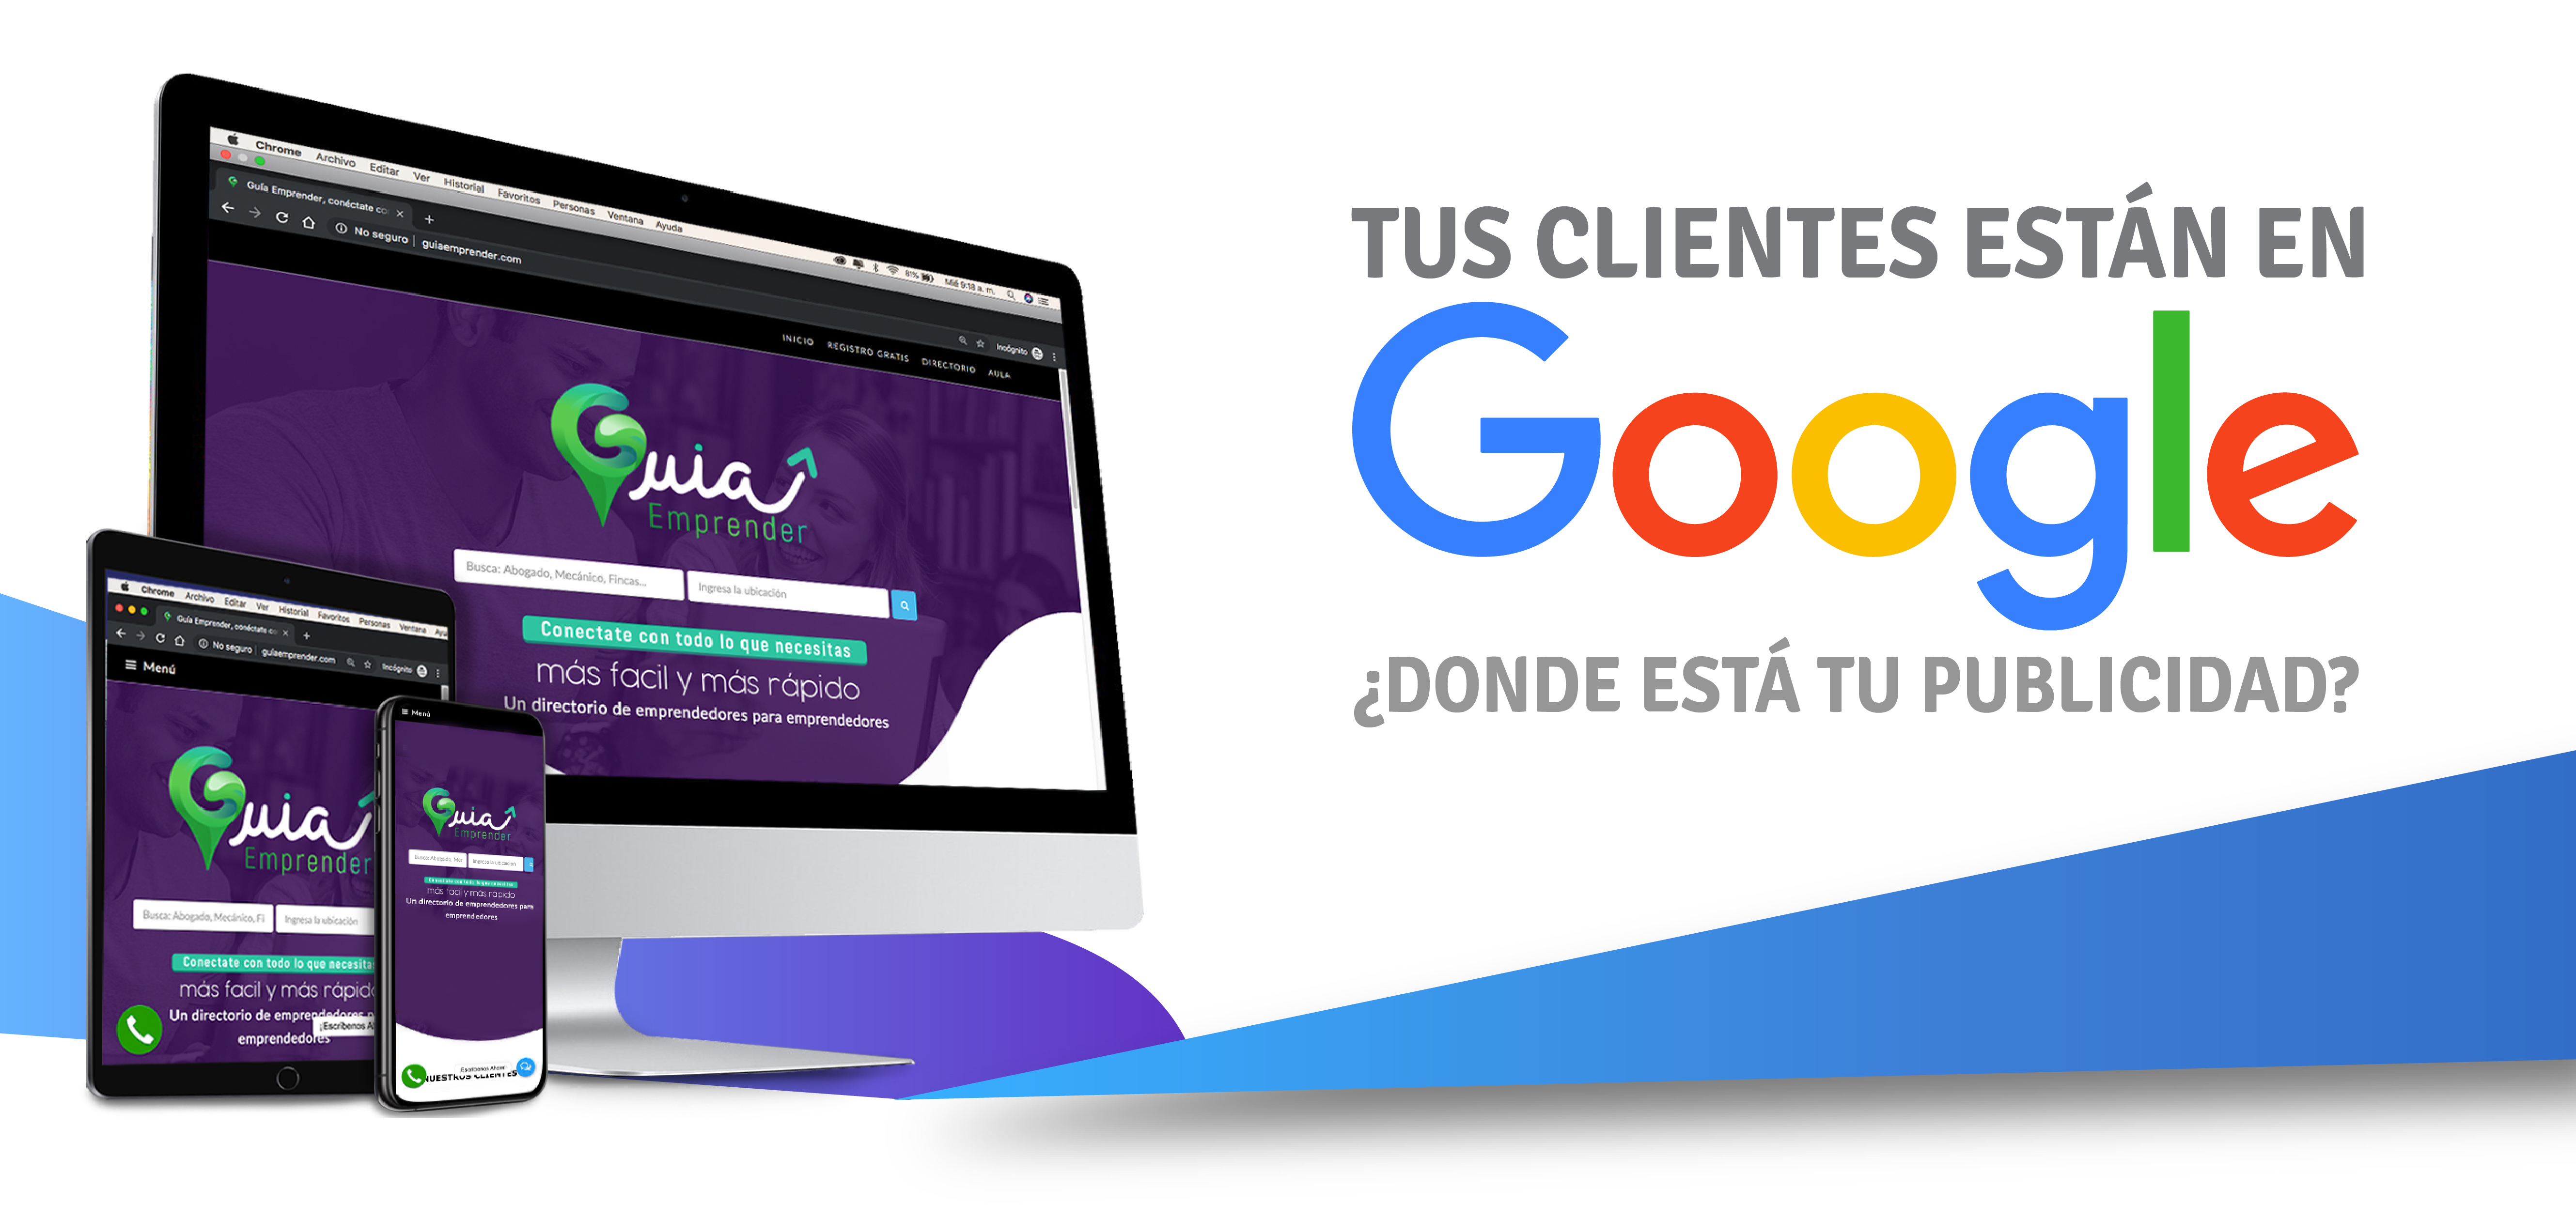 portafolio-clientes-google-business-publicidad-marketing-digital-02